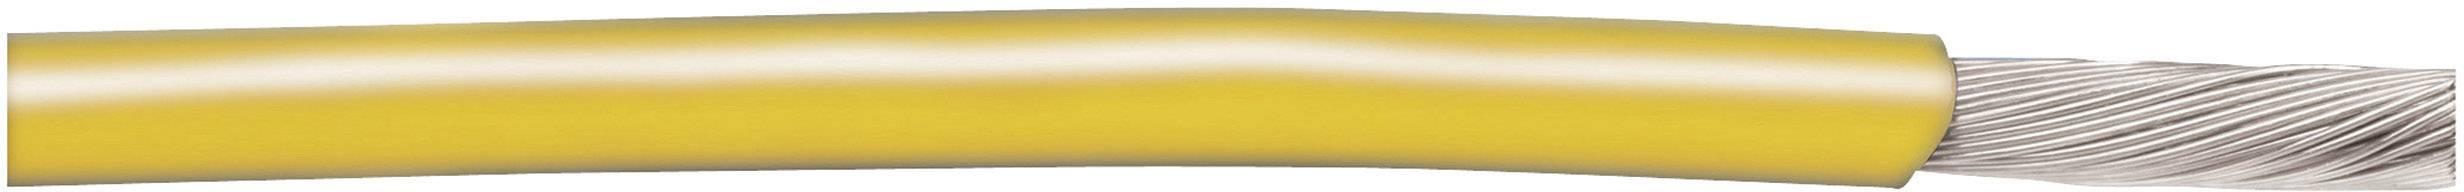 Opletenie / lanko AlphaWire 3057-005-YEL 1 x 1.31 mm², vonkajší Ø 2.33 mm, 30.5 m, žltá